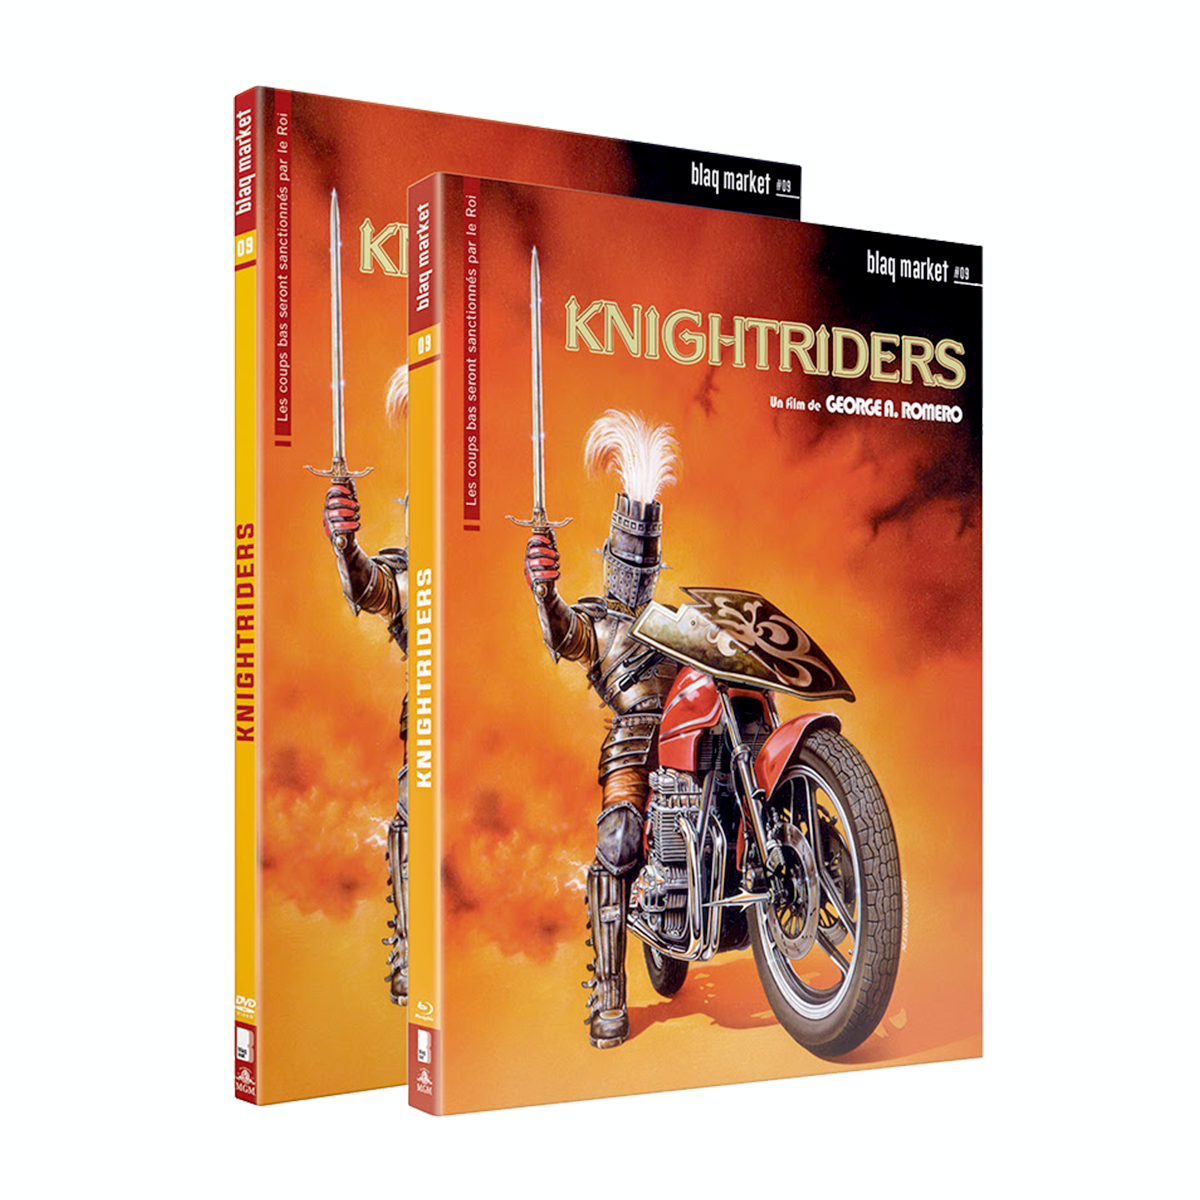 knightriders-cet-autre-film-engage-de-george-a-romero